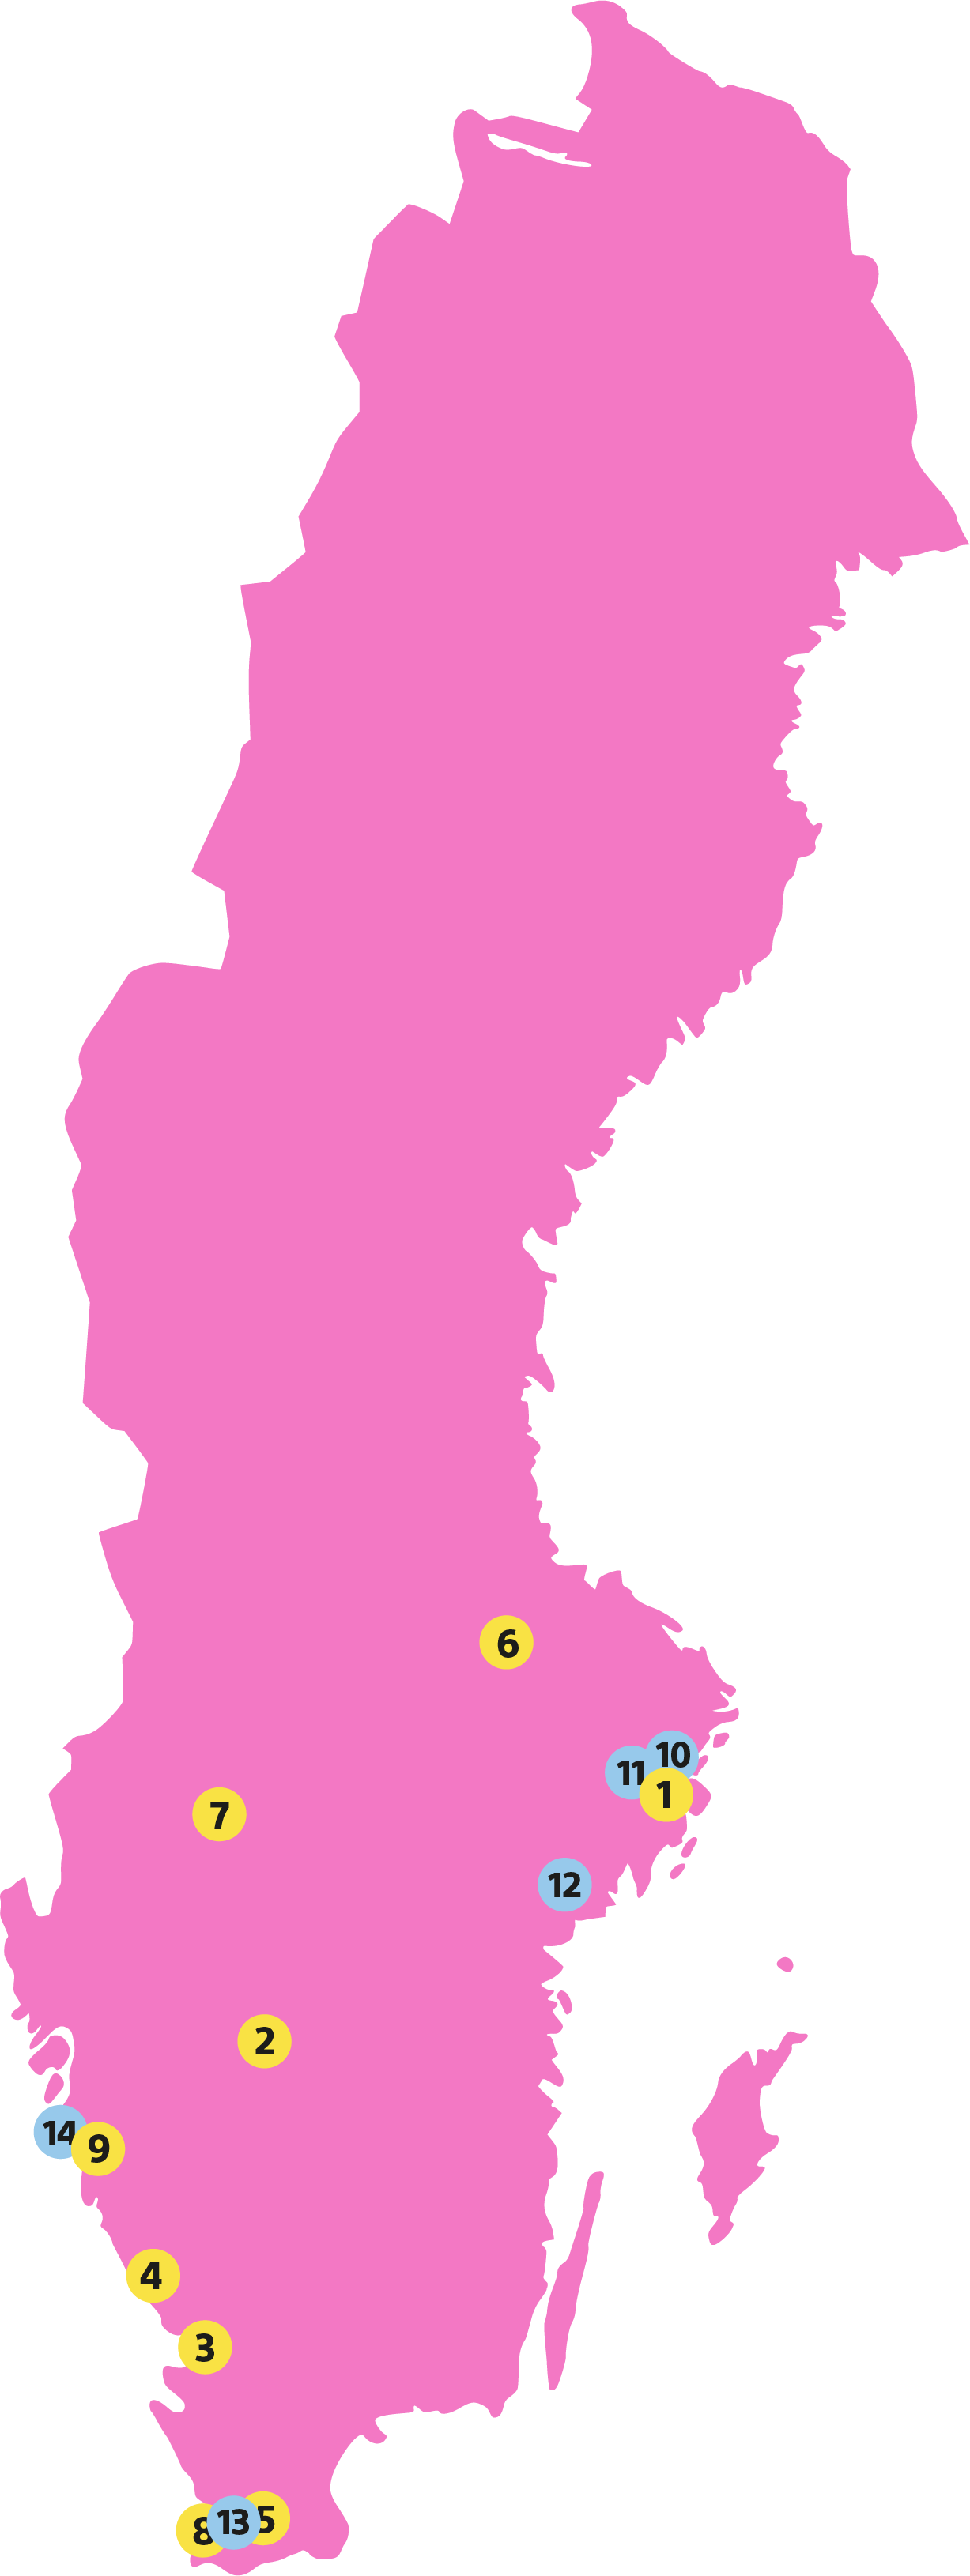 cws-map-sweden